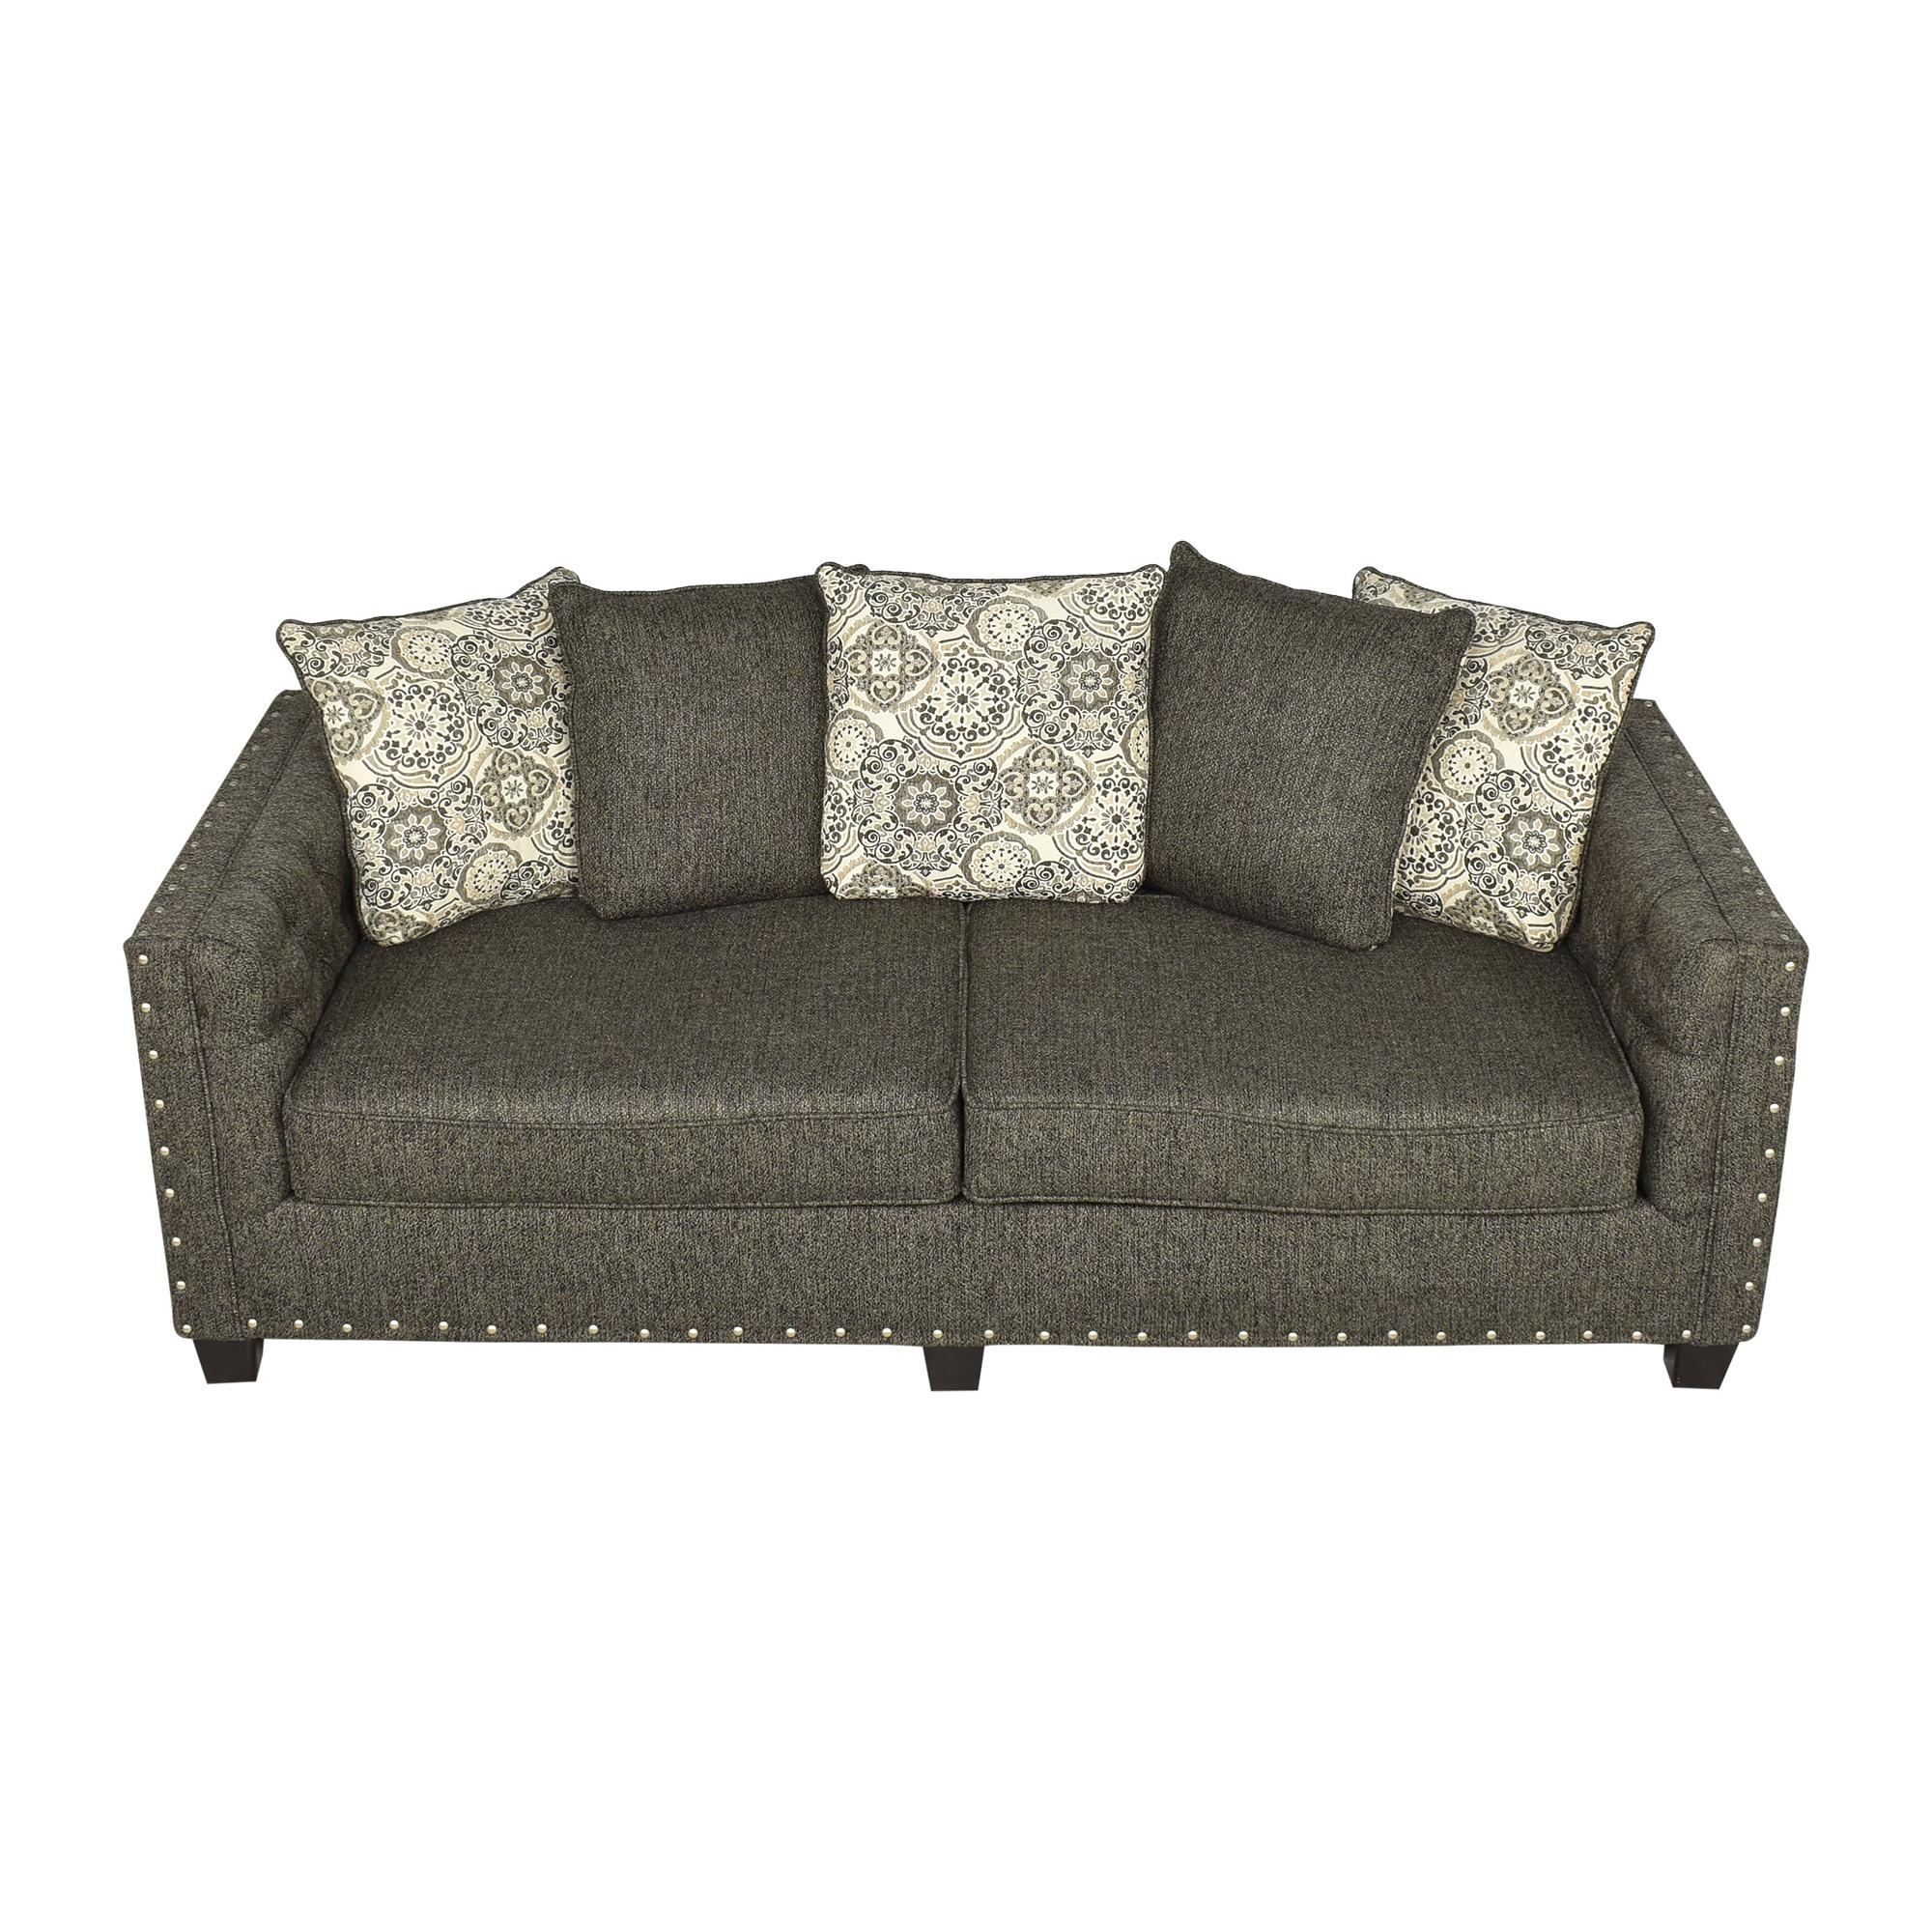 buy Hughes Furniture Hughes Furniture Nailhead Sofa online